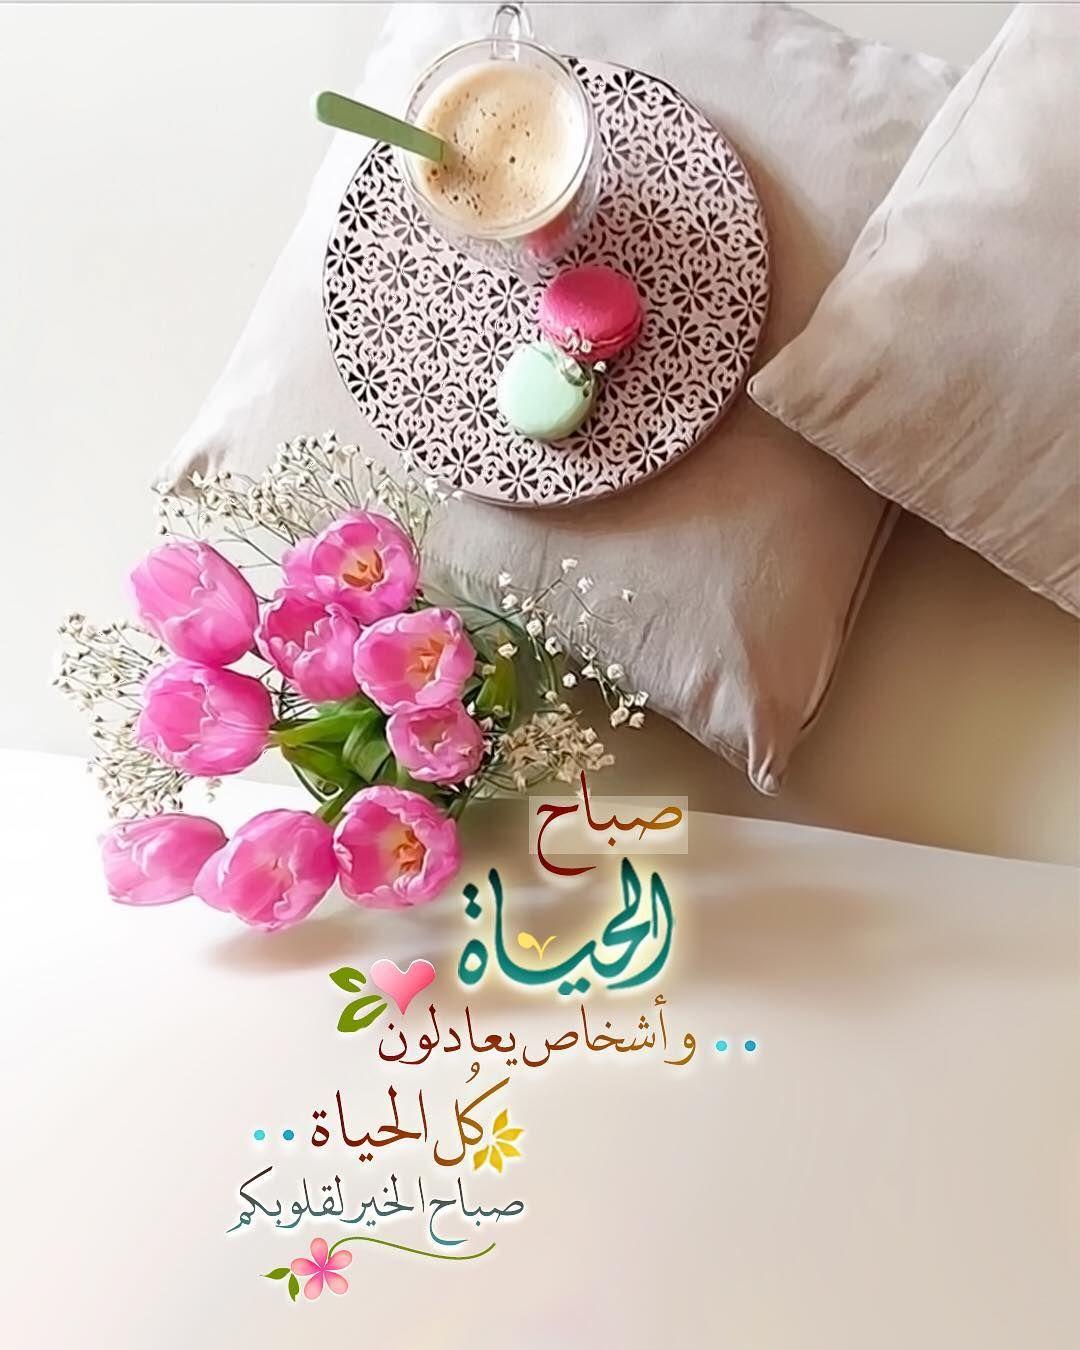 Pearla0203 On Instagram ص باح الح ياة وأشخاص يعادلون ك ل الحياة ㅤㅤㅤㅤㅤ ص باح الخير Evening Greetings Good Morning Arabic Morning Greetings Quotes